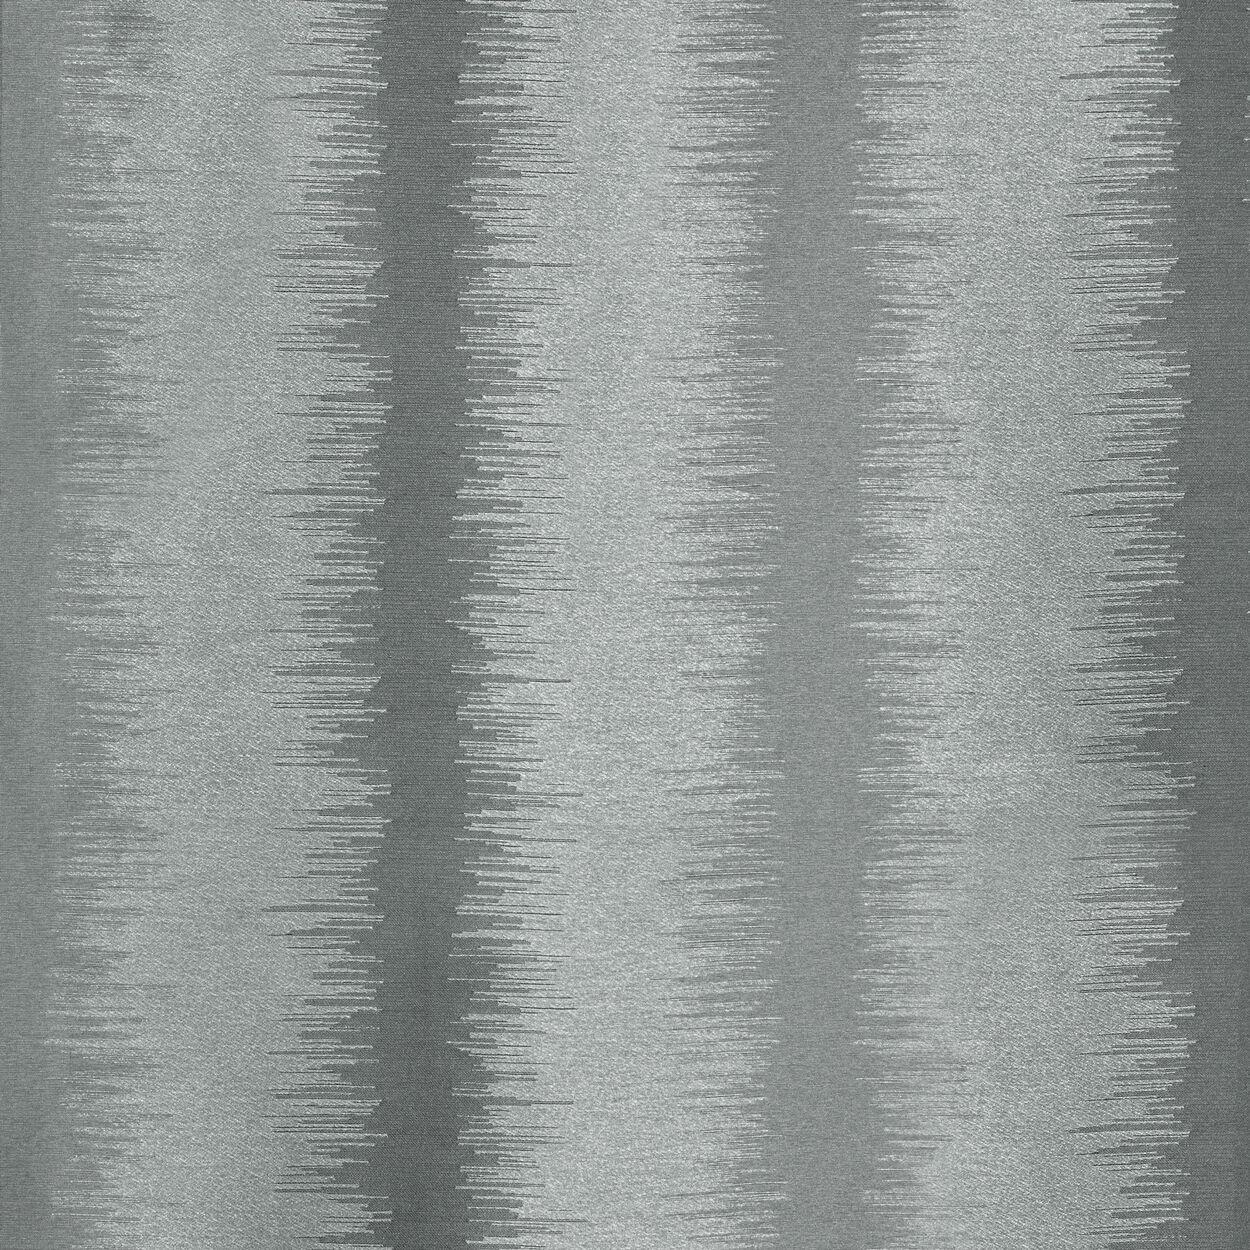 Blackout Curtain - Straker